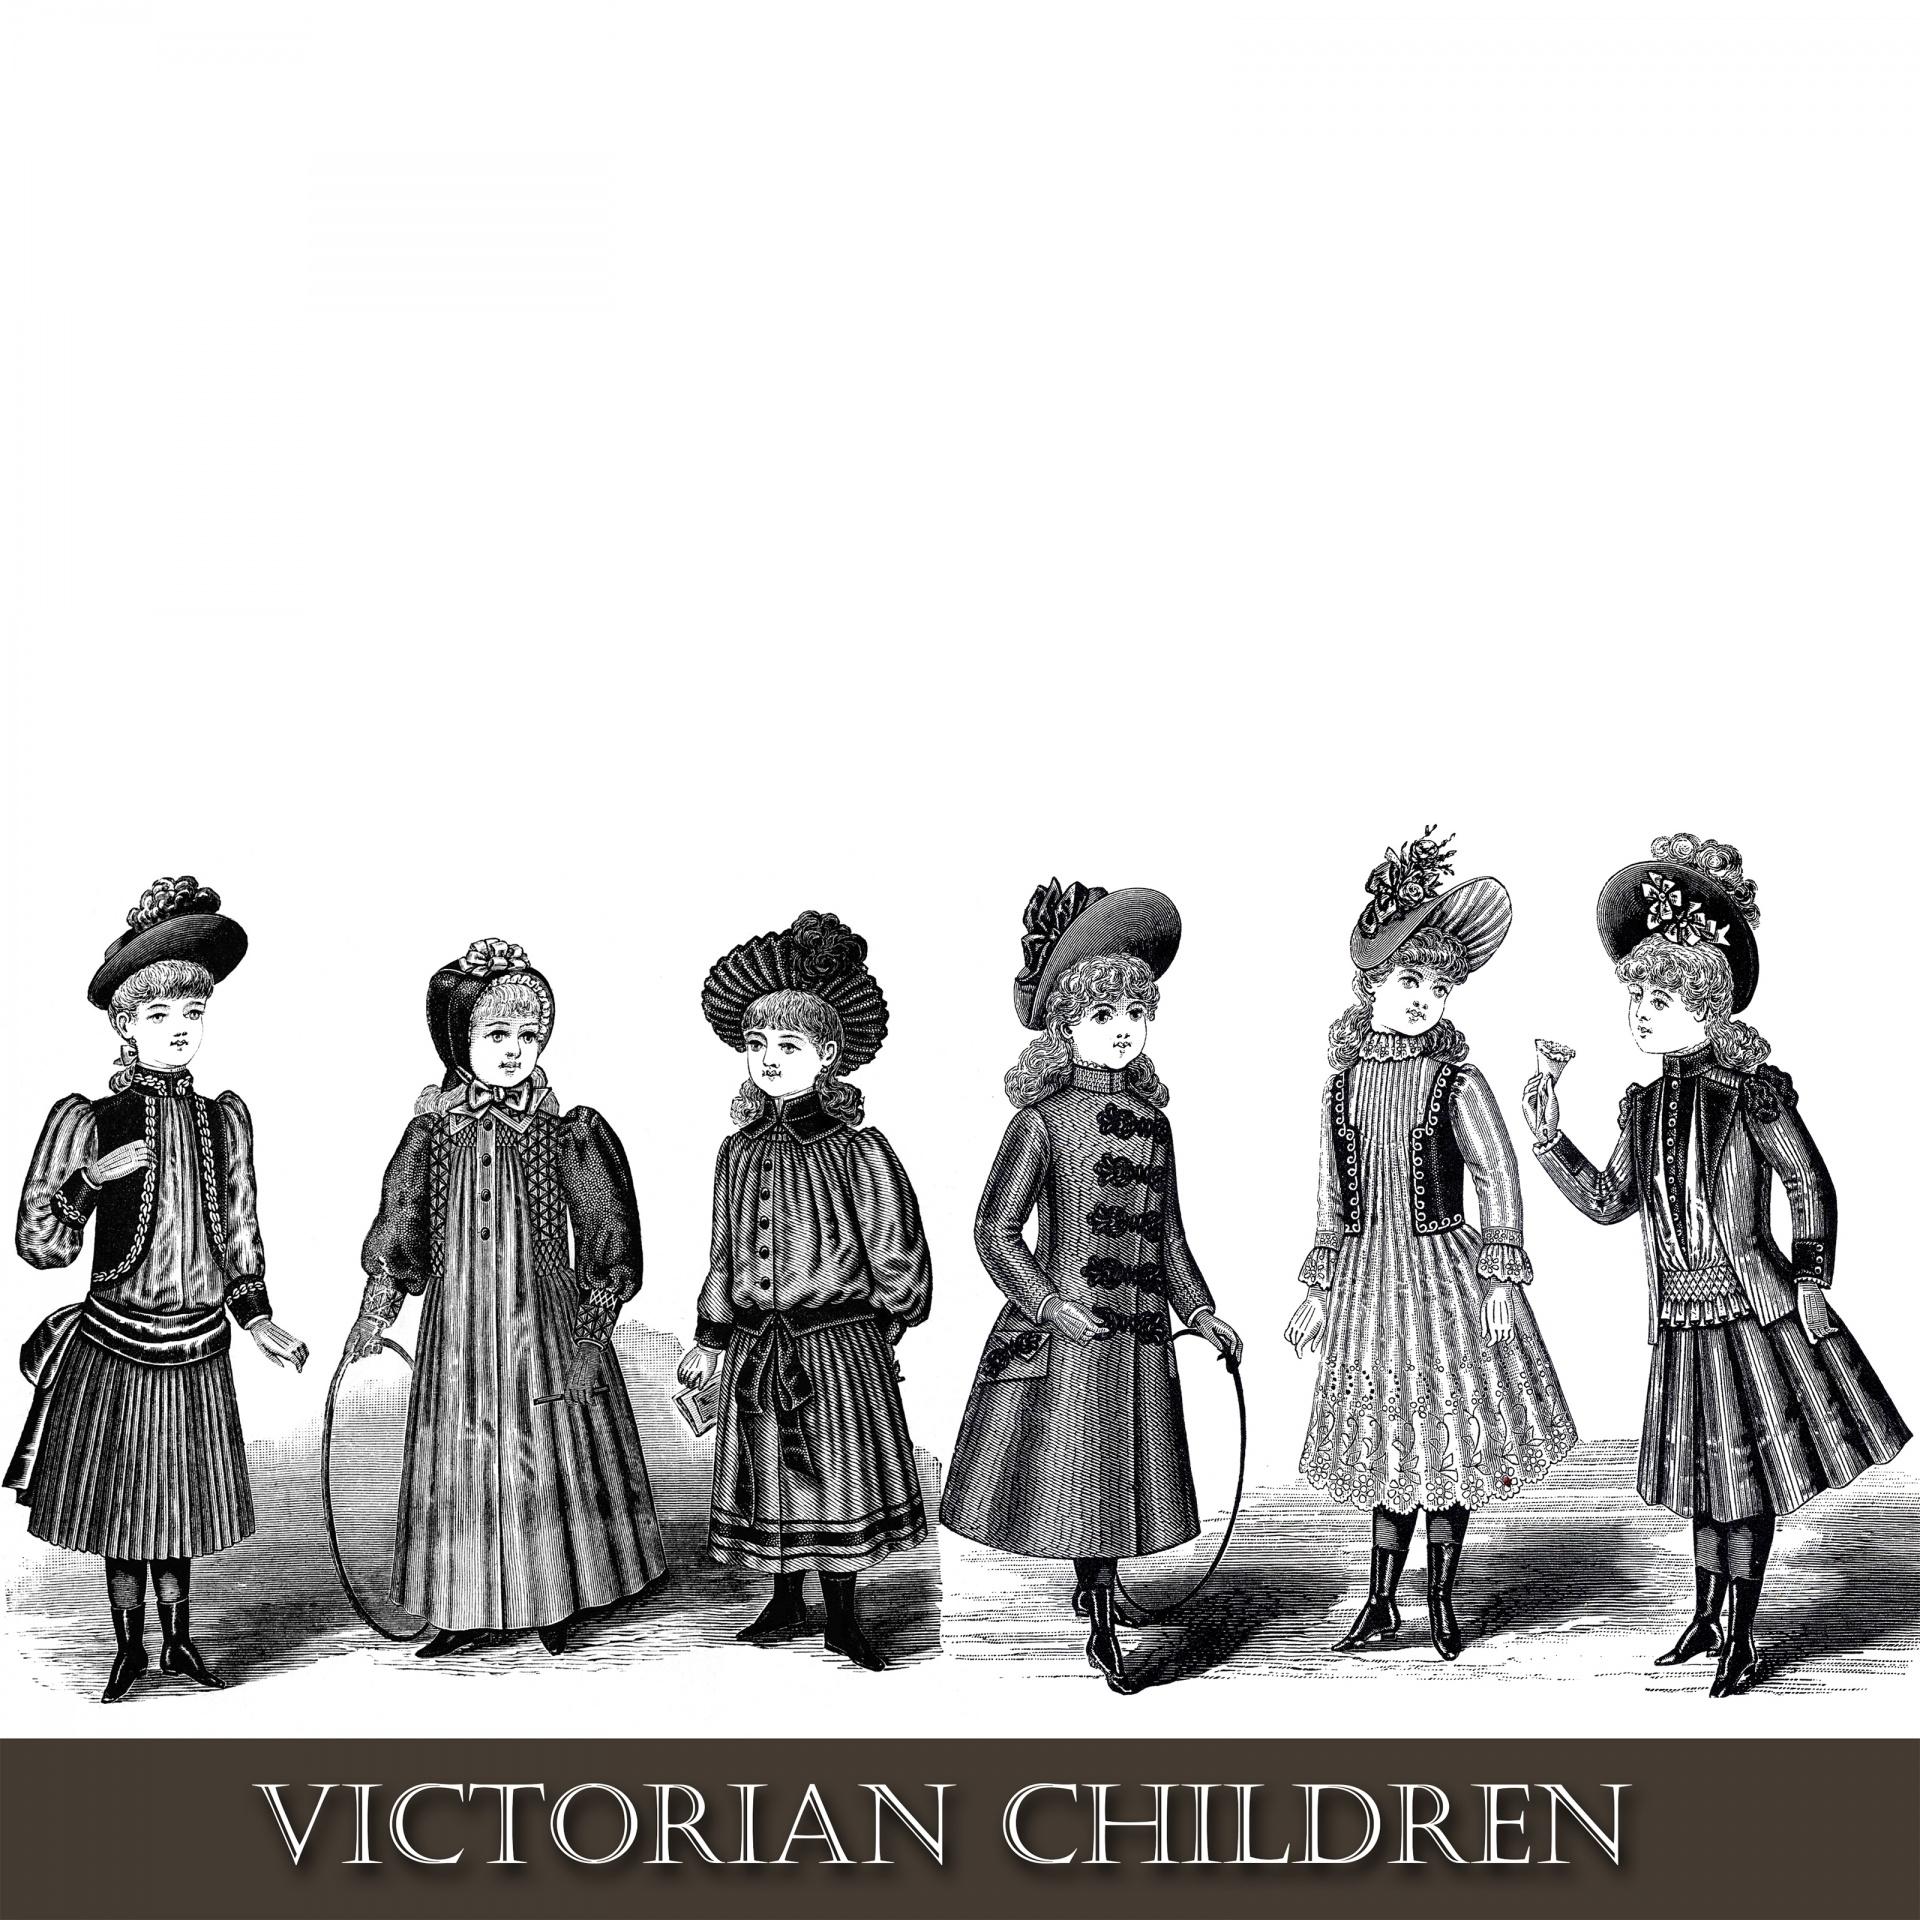 Victorian clipart. Children free stock photo